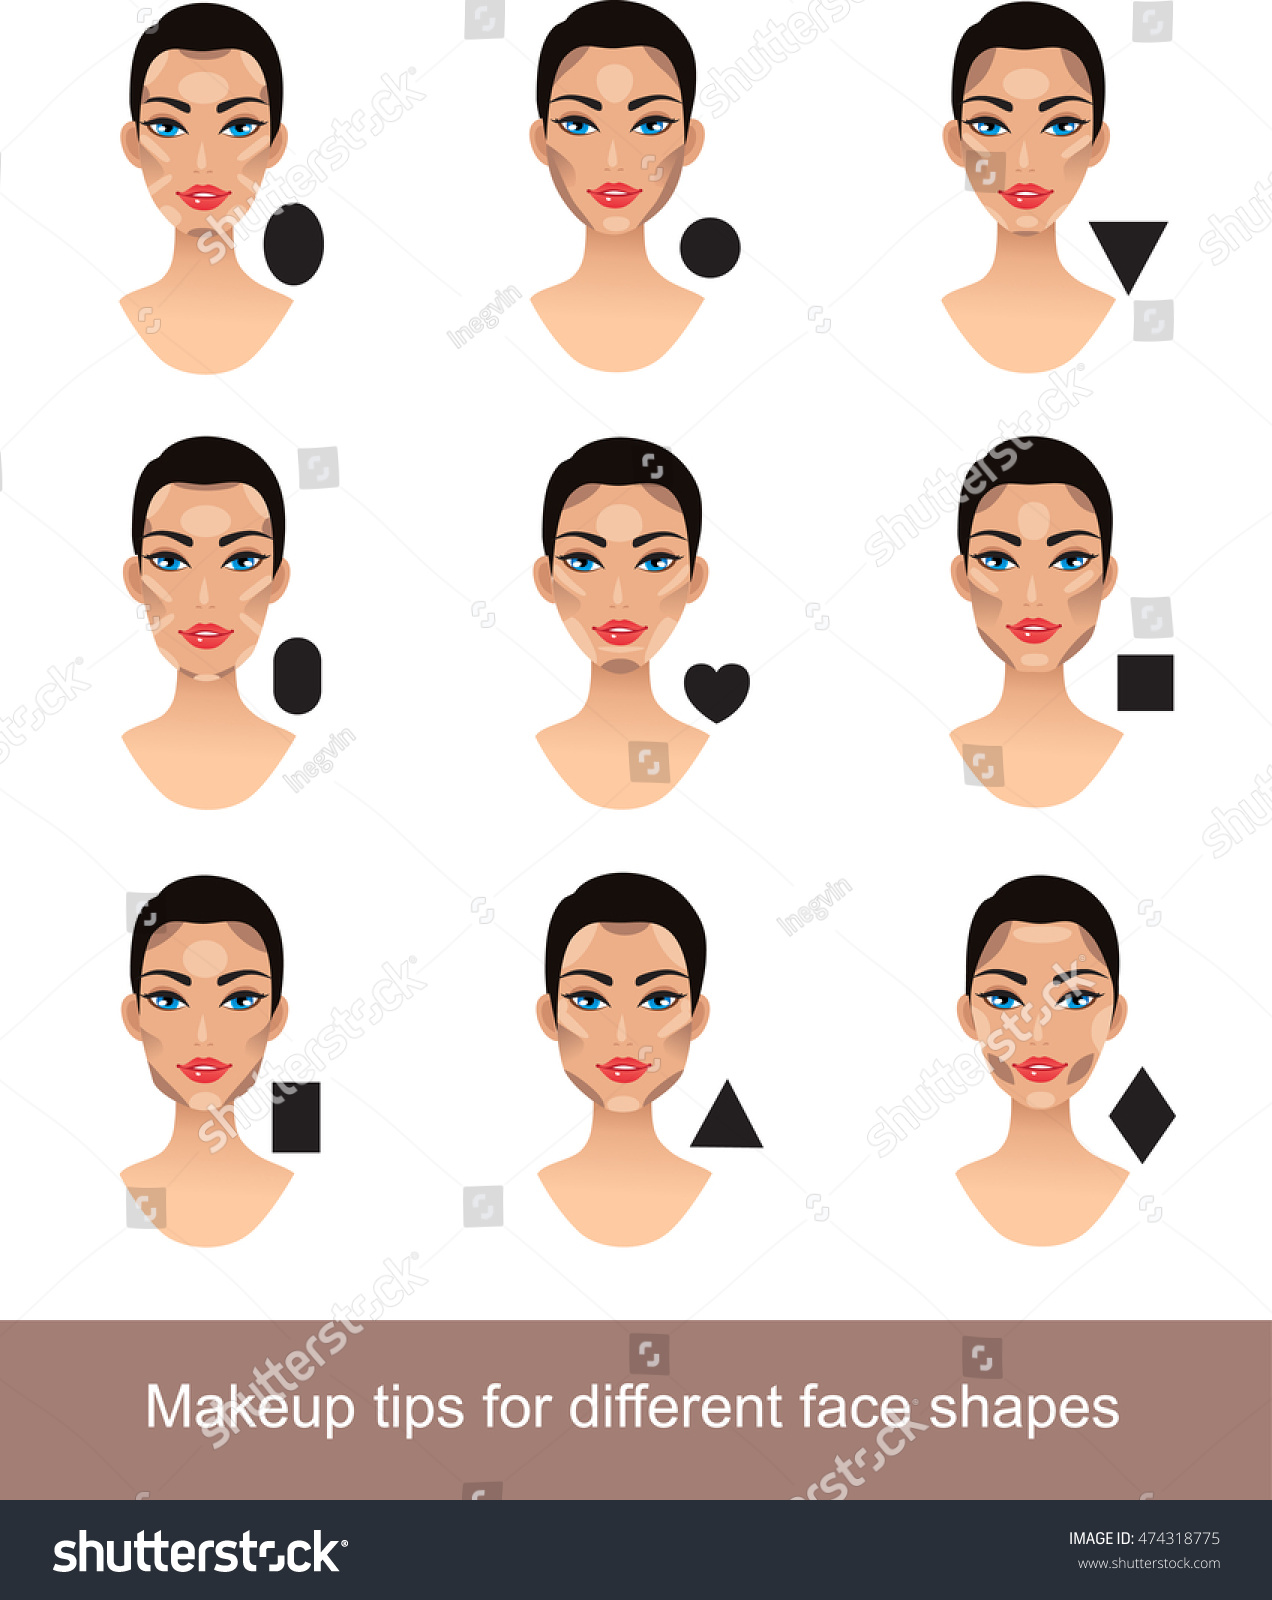 Makeup different face shapes contouring tricks stock vector makeup for different face shapes contouring tricks for your face shape urmus Image collections